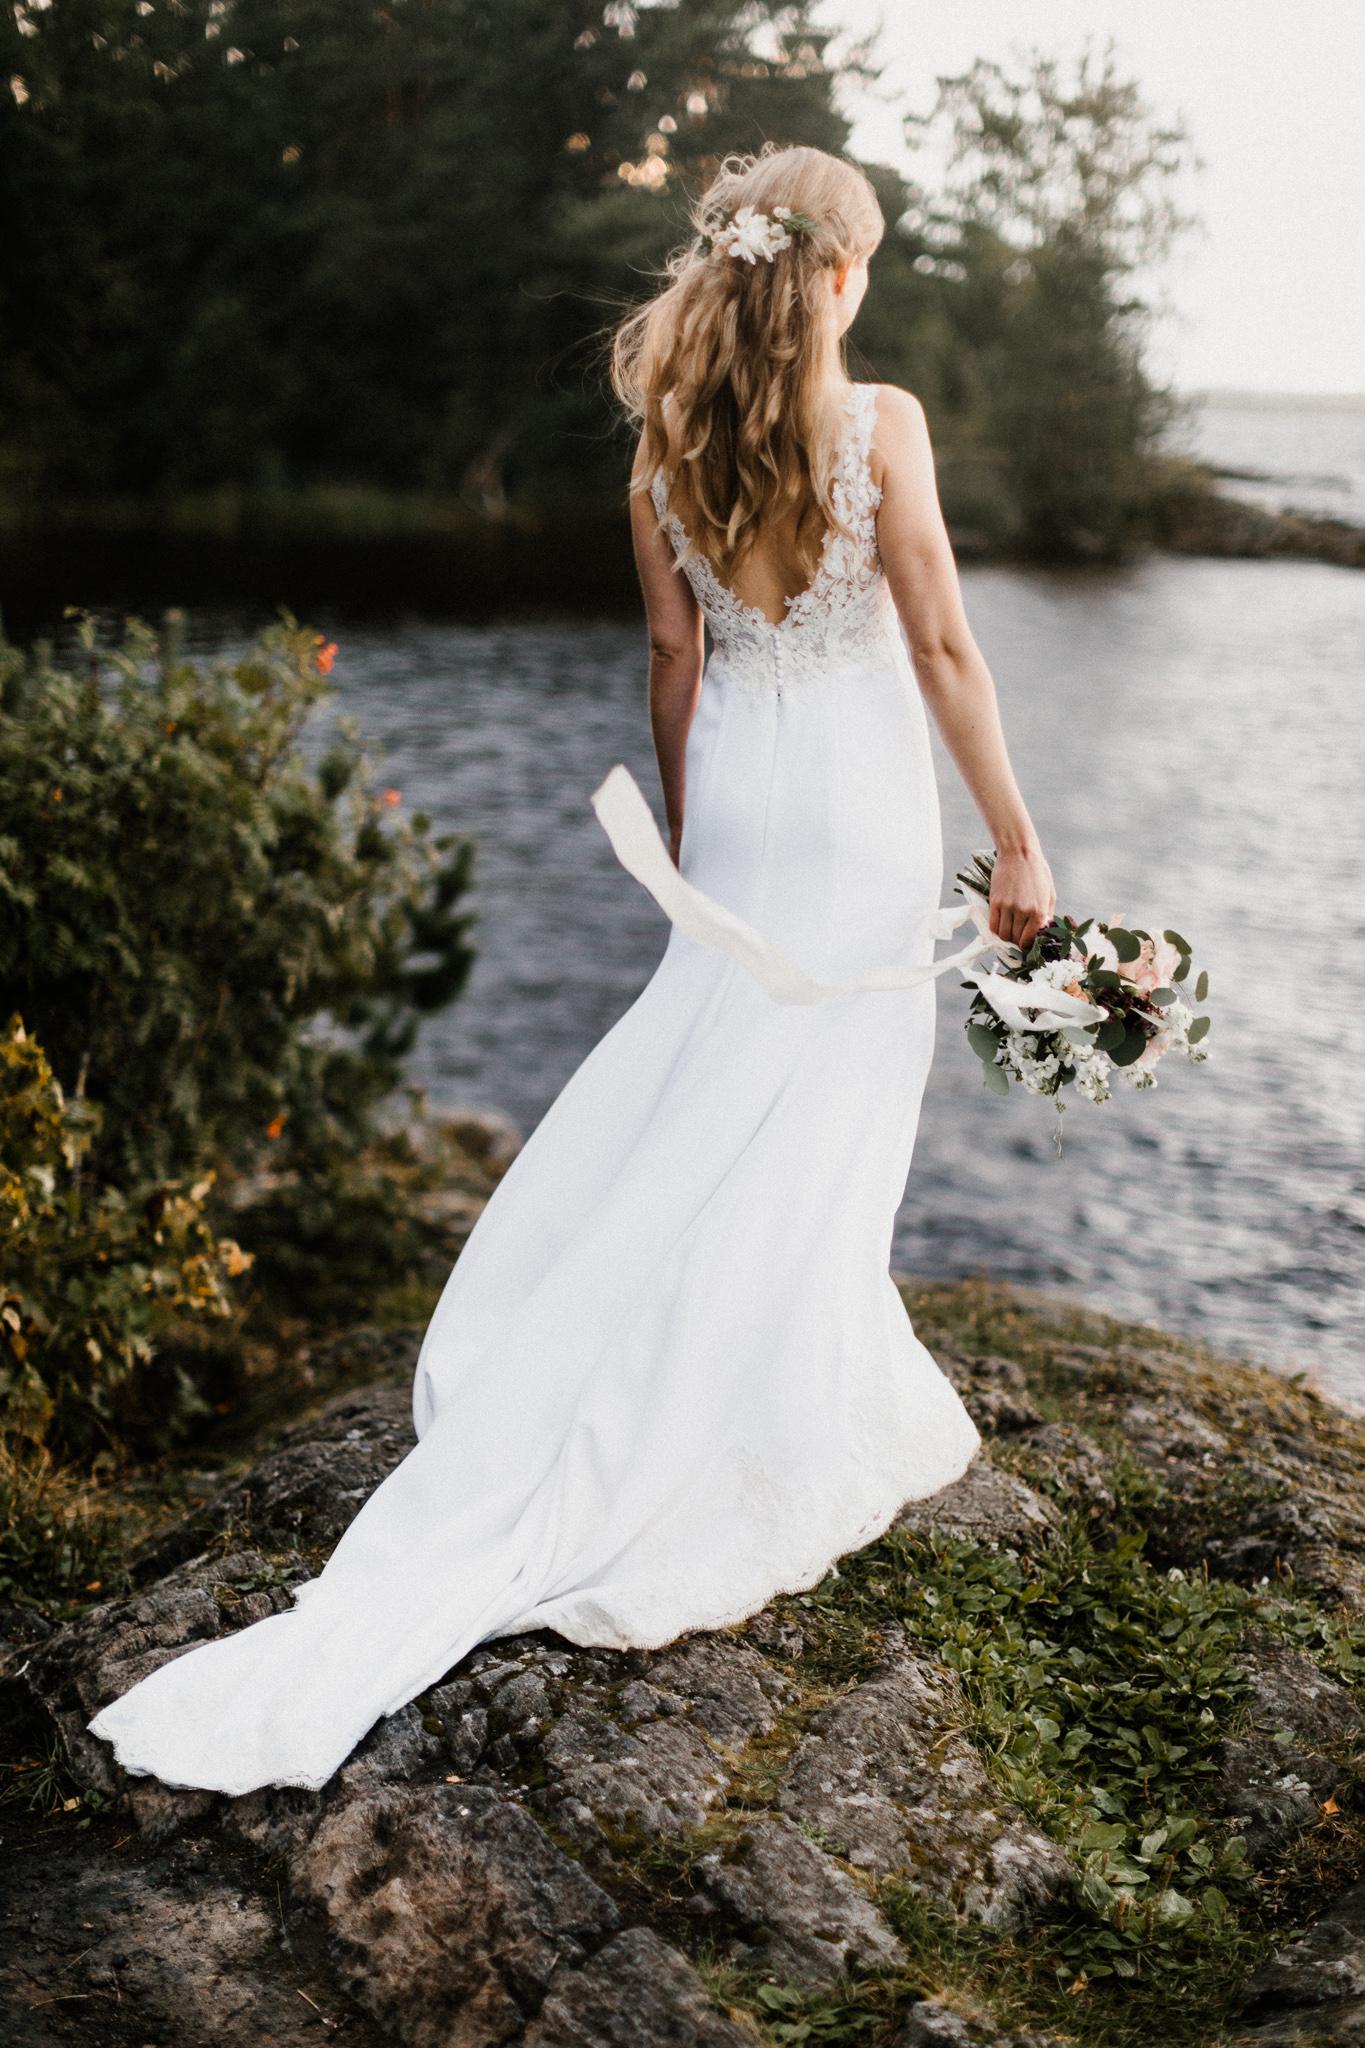 Johanna + Mikko - Tampere - Photo by Patrick Karkkolainen Wedding Photographer-164.jpg